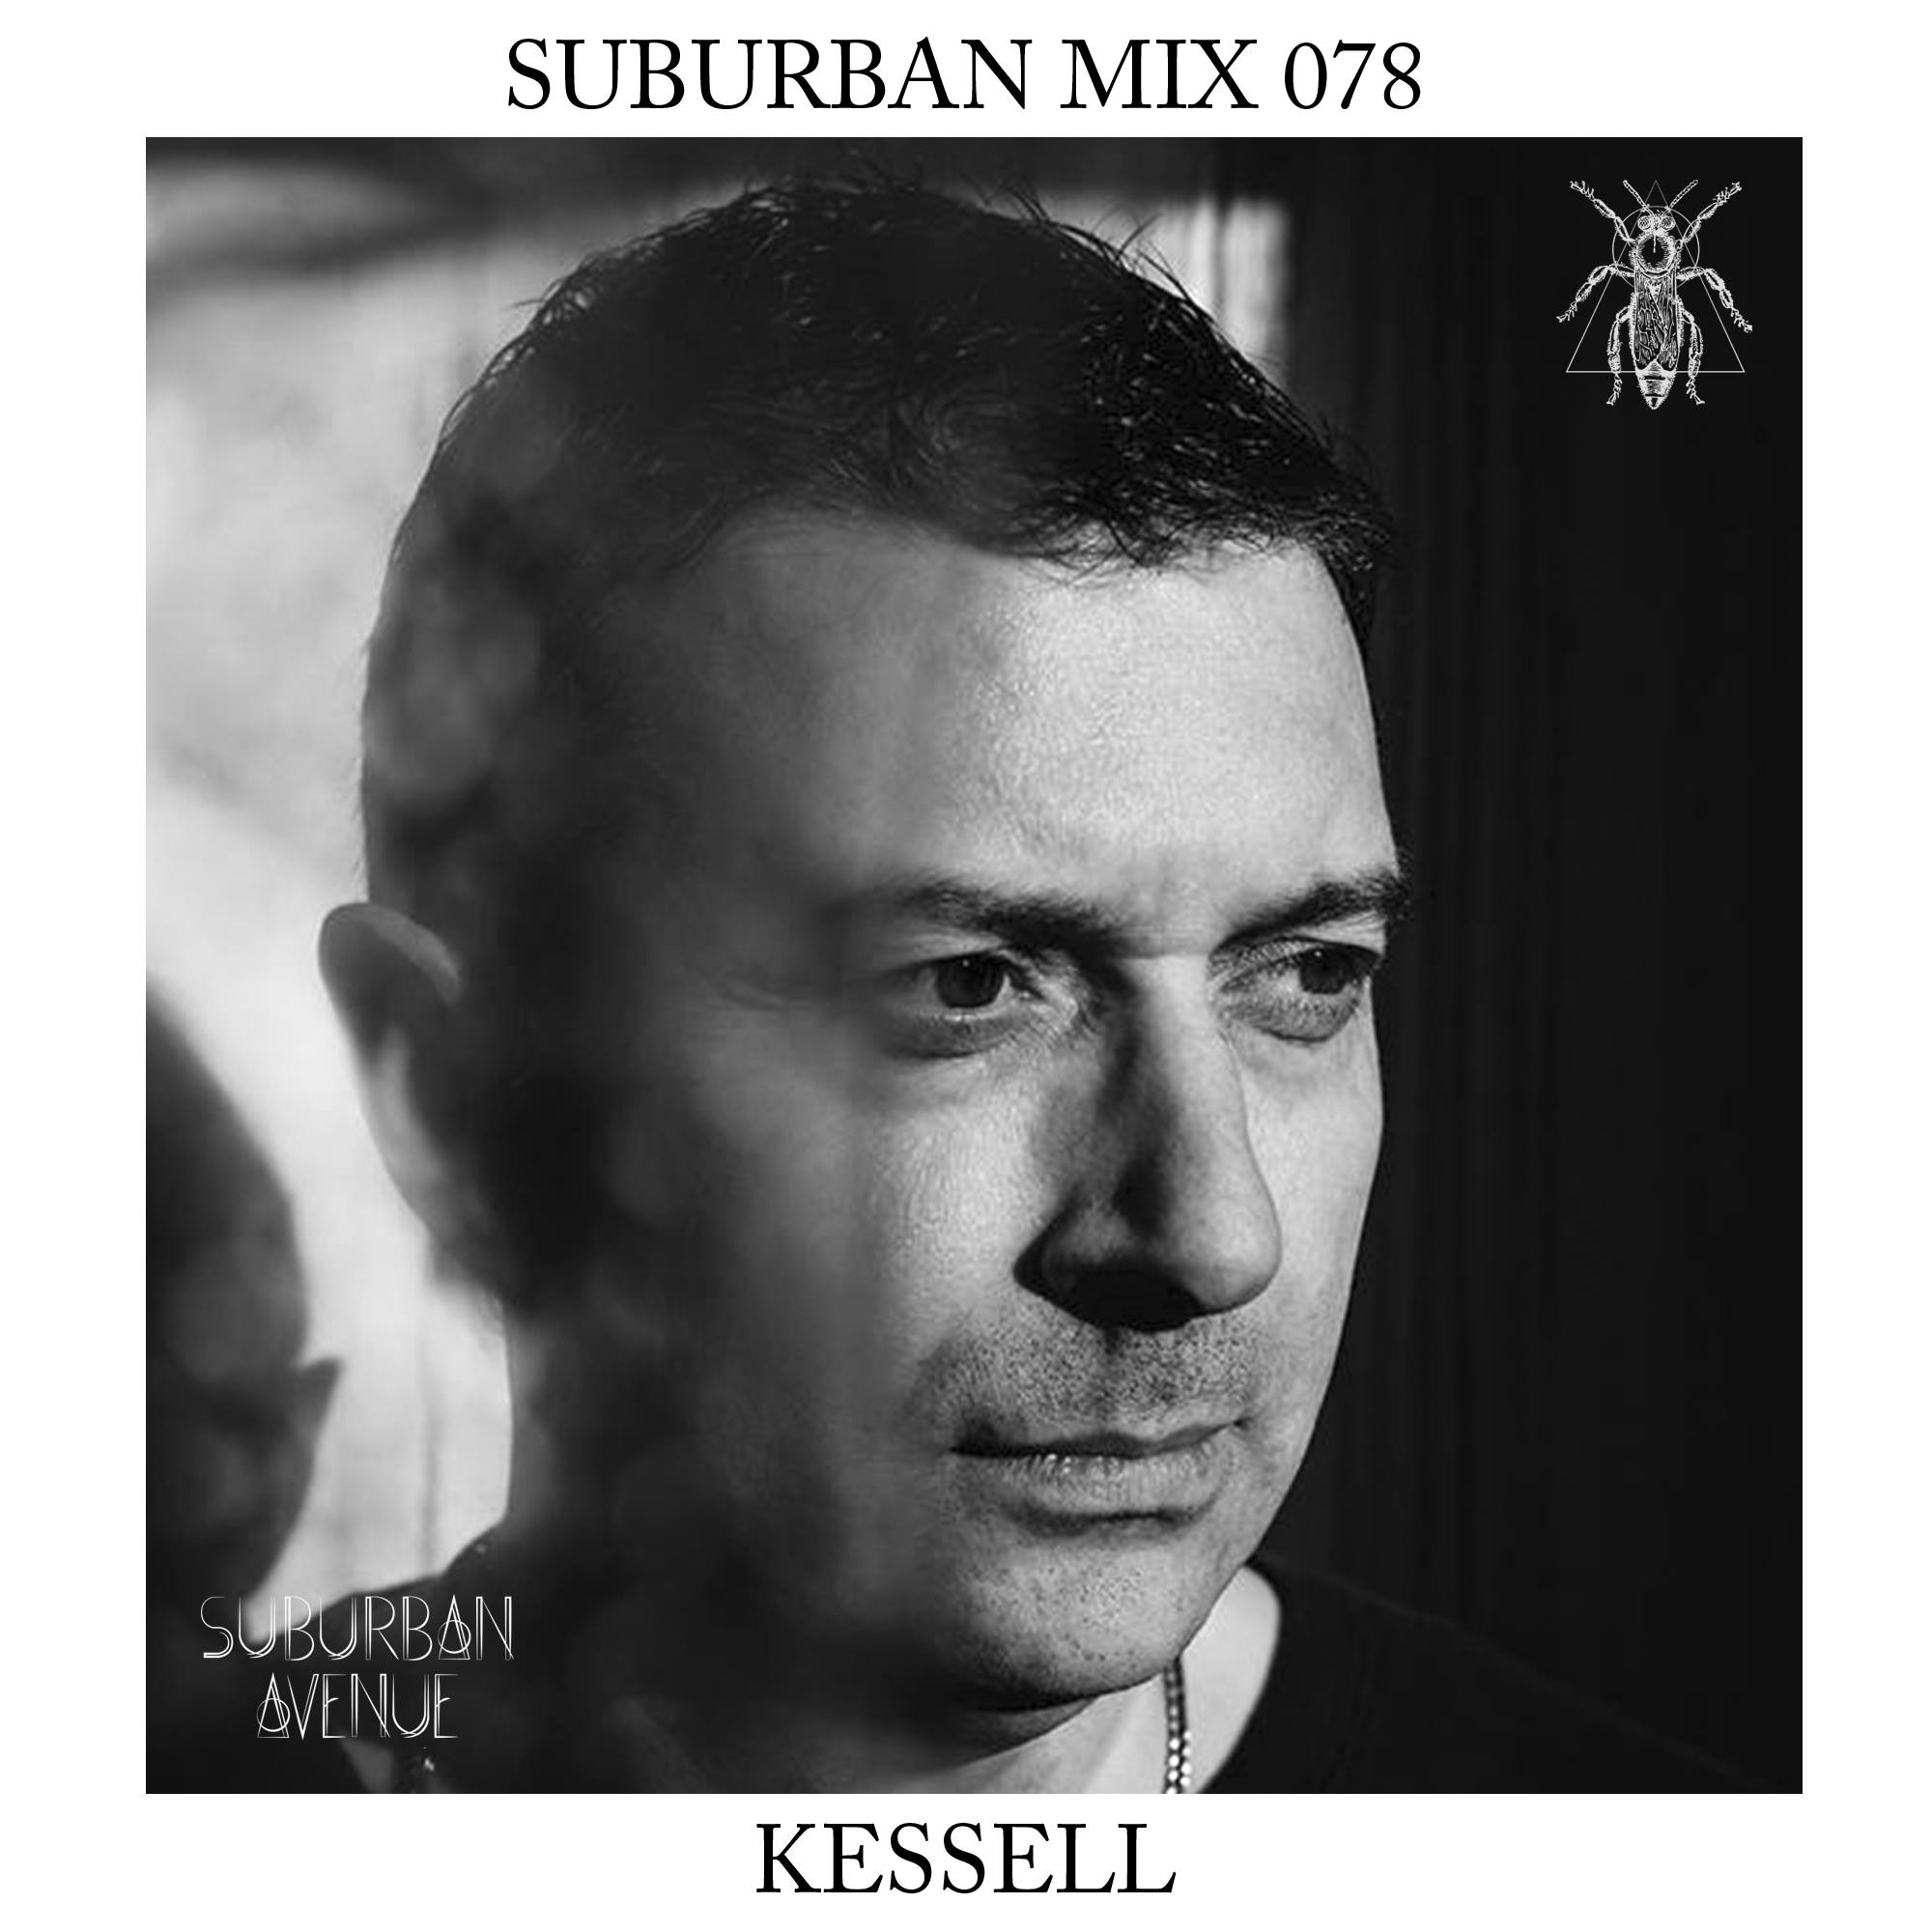 Suburban Mix 078 - Kessell